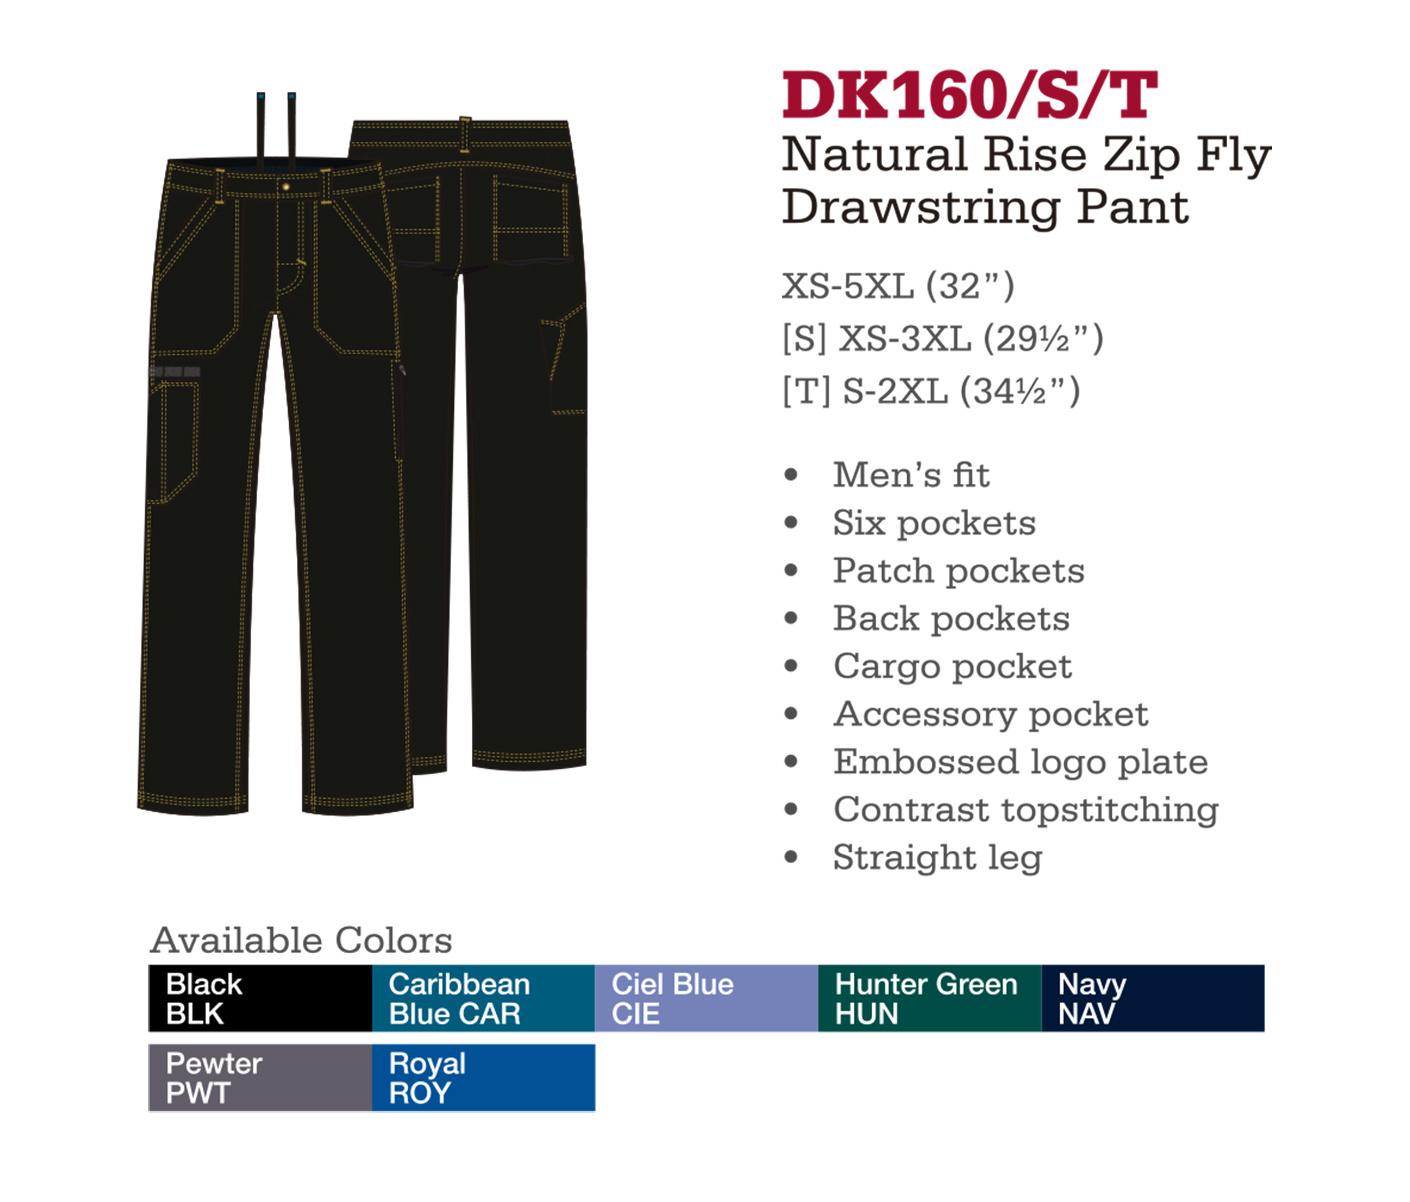 Pantalón de Cordones con Cremallera de Levantado Natural. DK160/S/T.